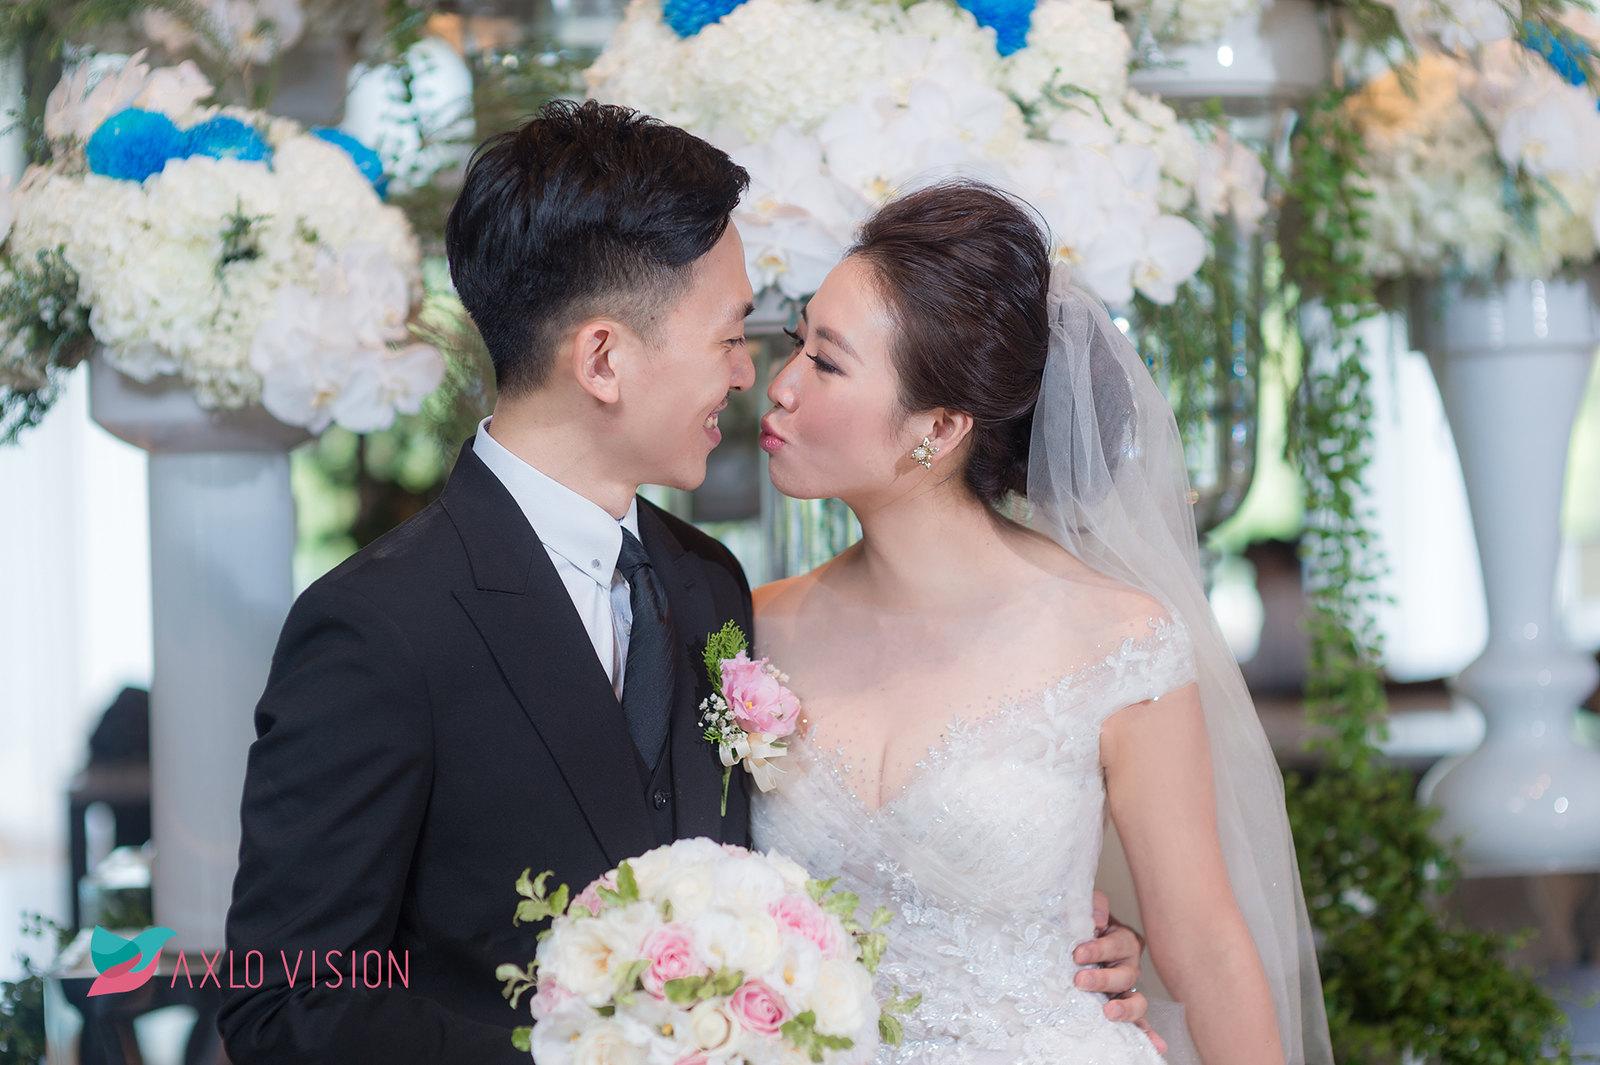 20170916 WeddingDay_083